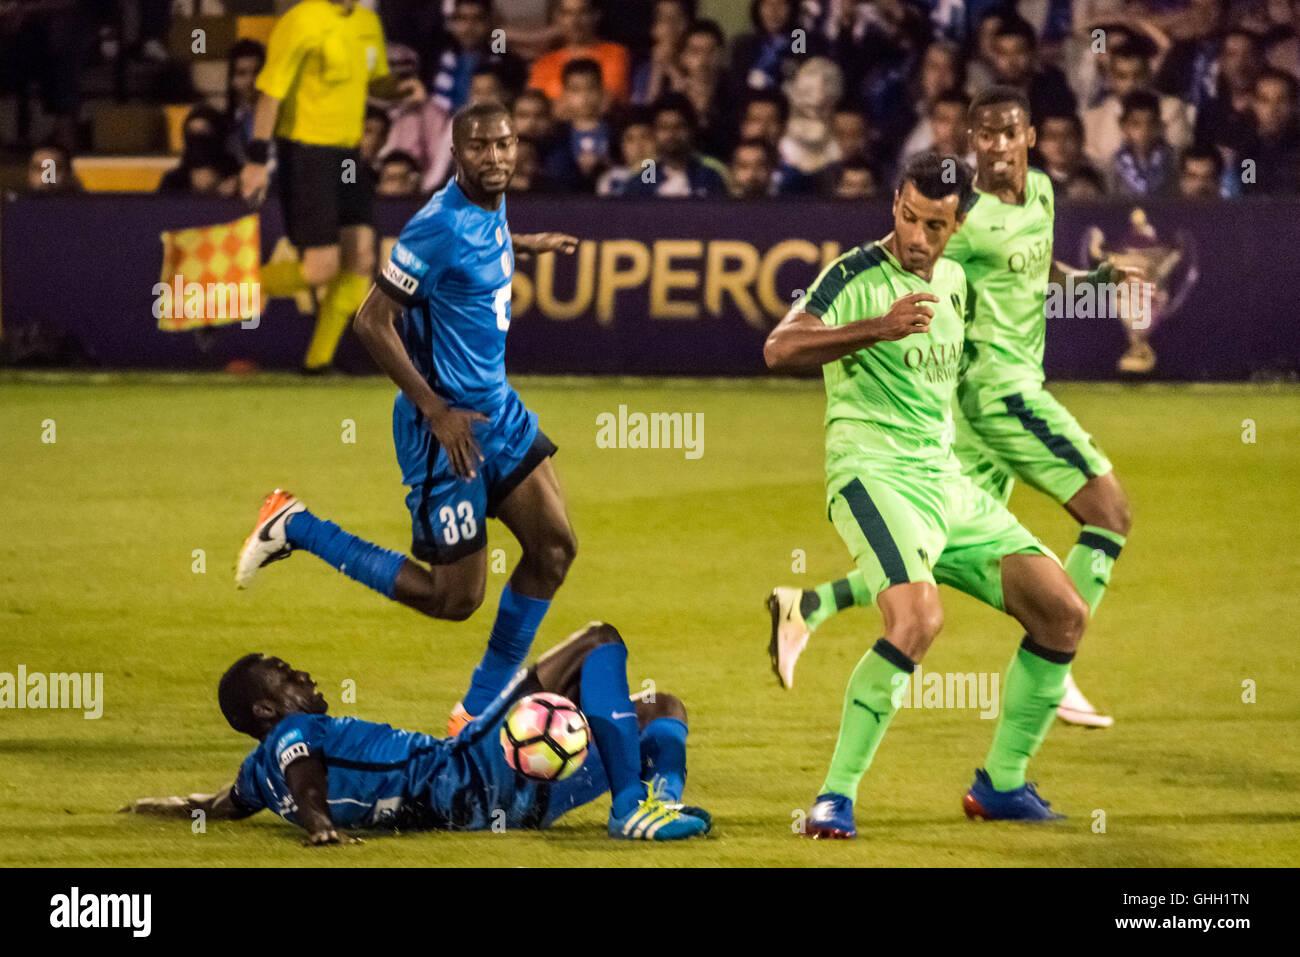 London, UK. 8th August, 2016. Abdulmalek Al-Khaibri #6 (ground), Osama Hawsawi (#33). Al-Ahli vs Al-Hilal Saudi - Stock Image